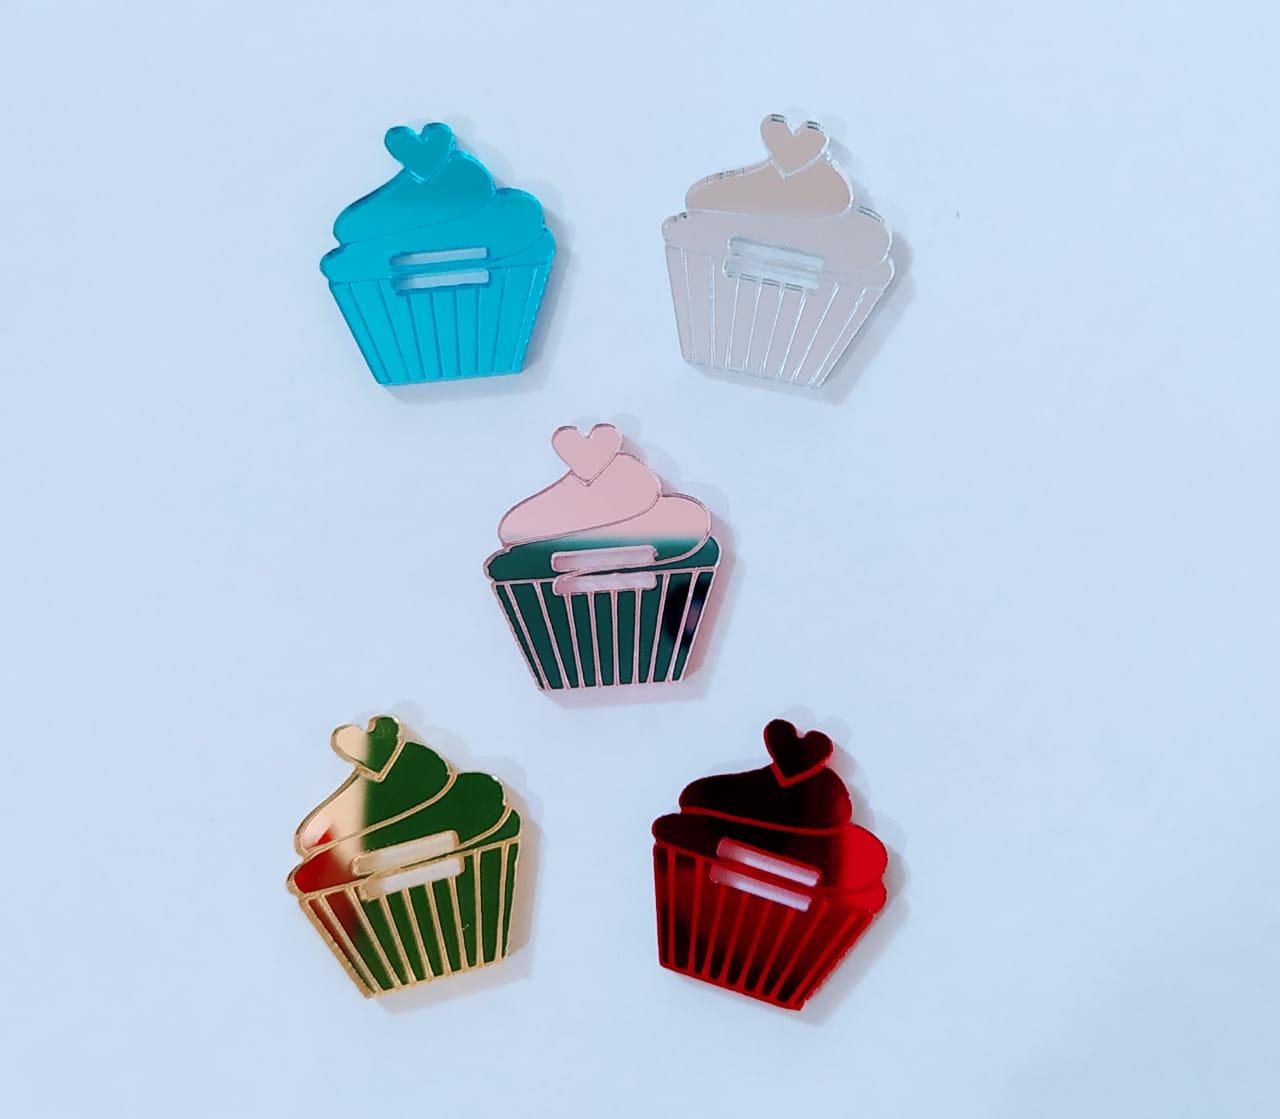 Passante para elástico - Cupcake - 2cm (10 unidades)